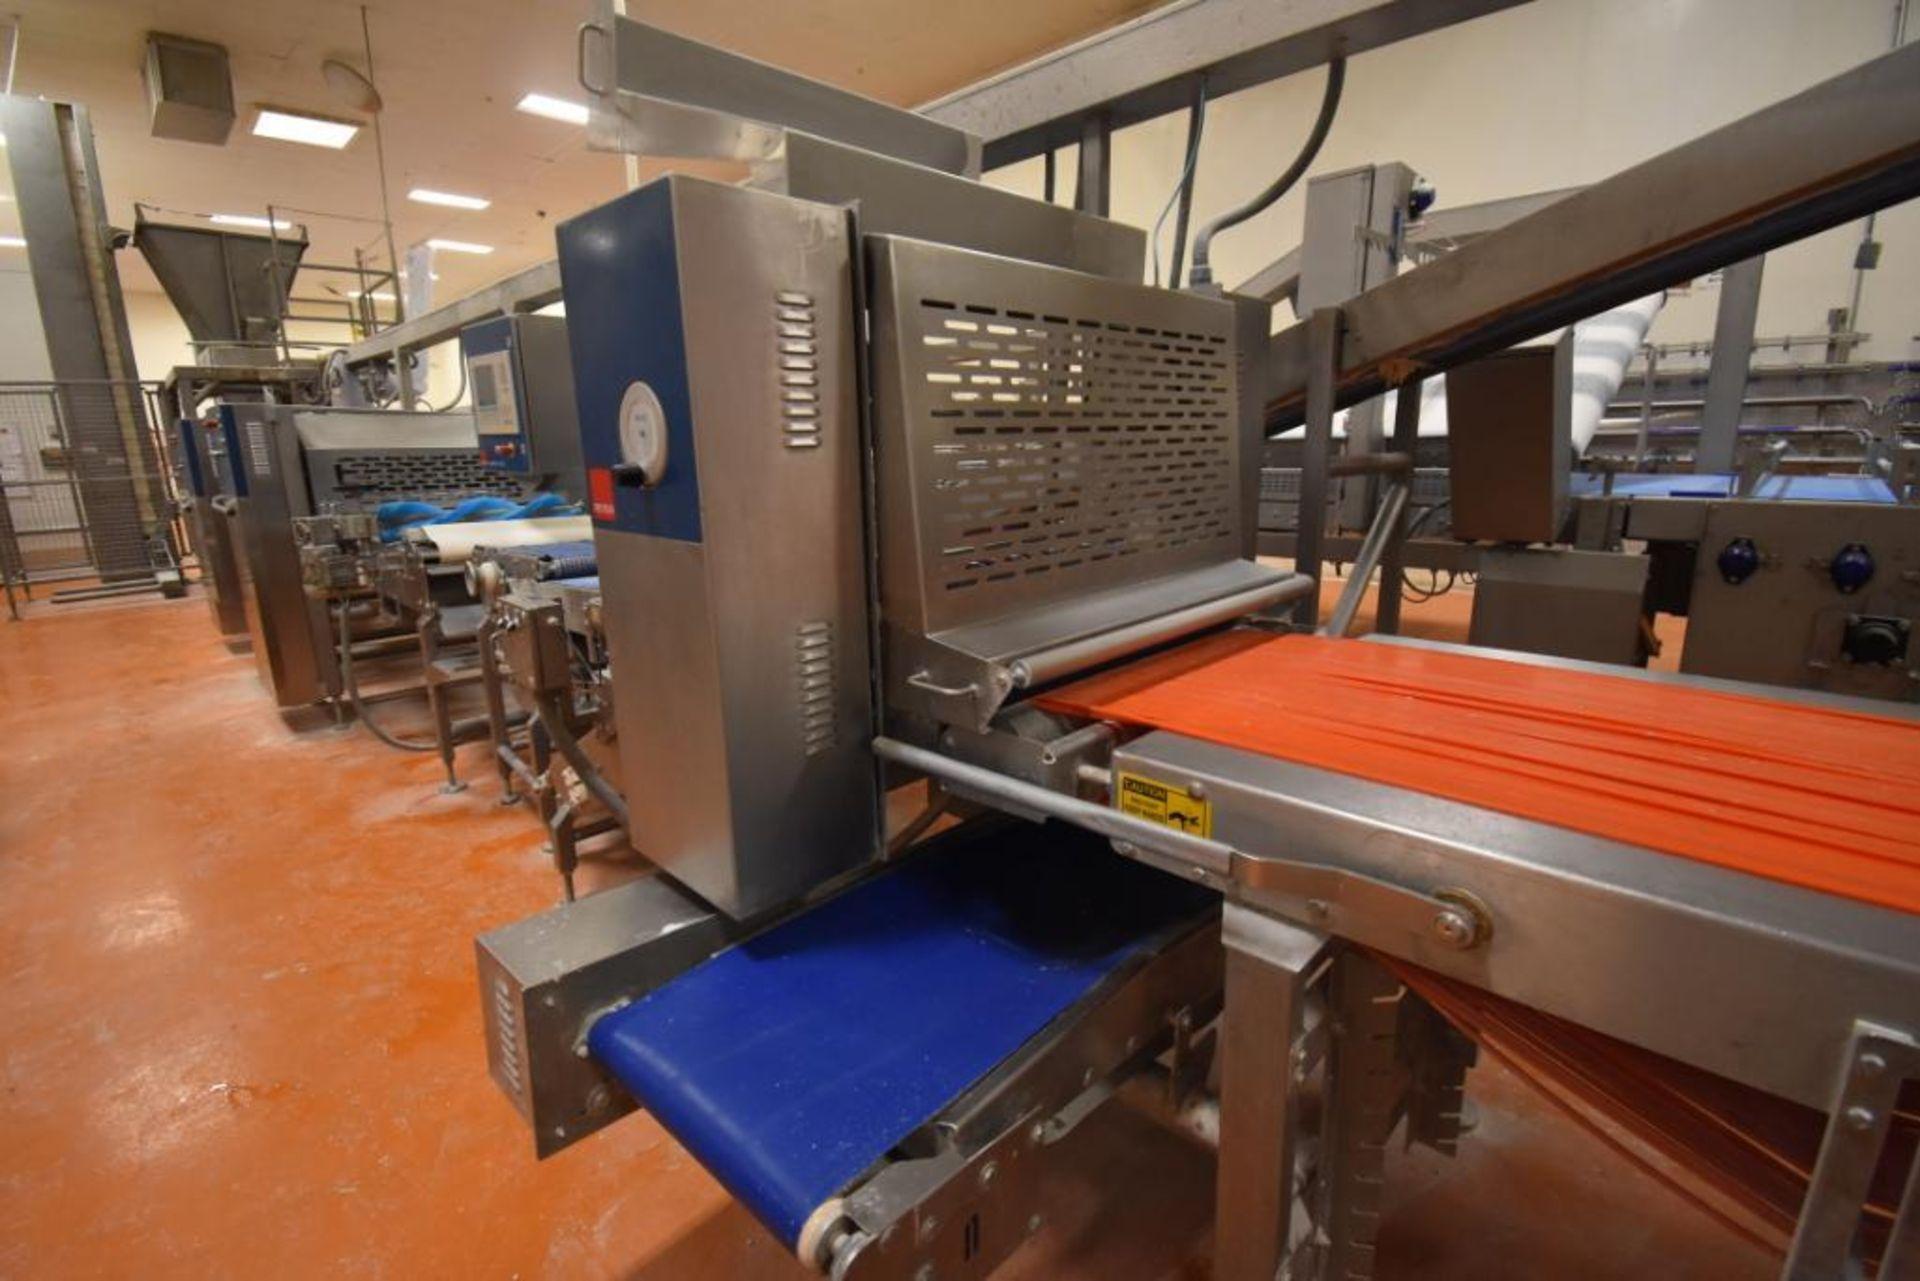 2007 Fritsch Laminator 3000 dough line - Image 100 of 280